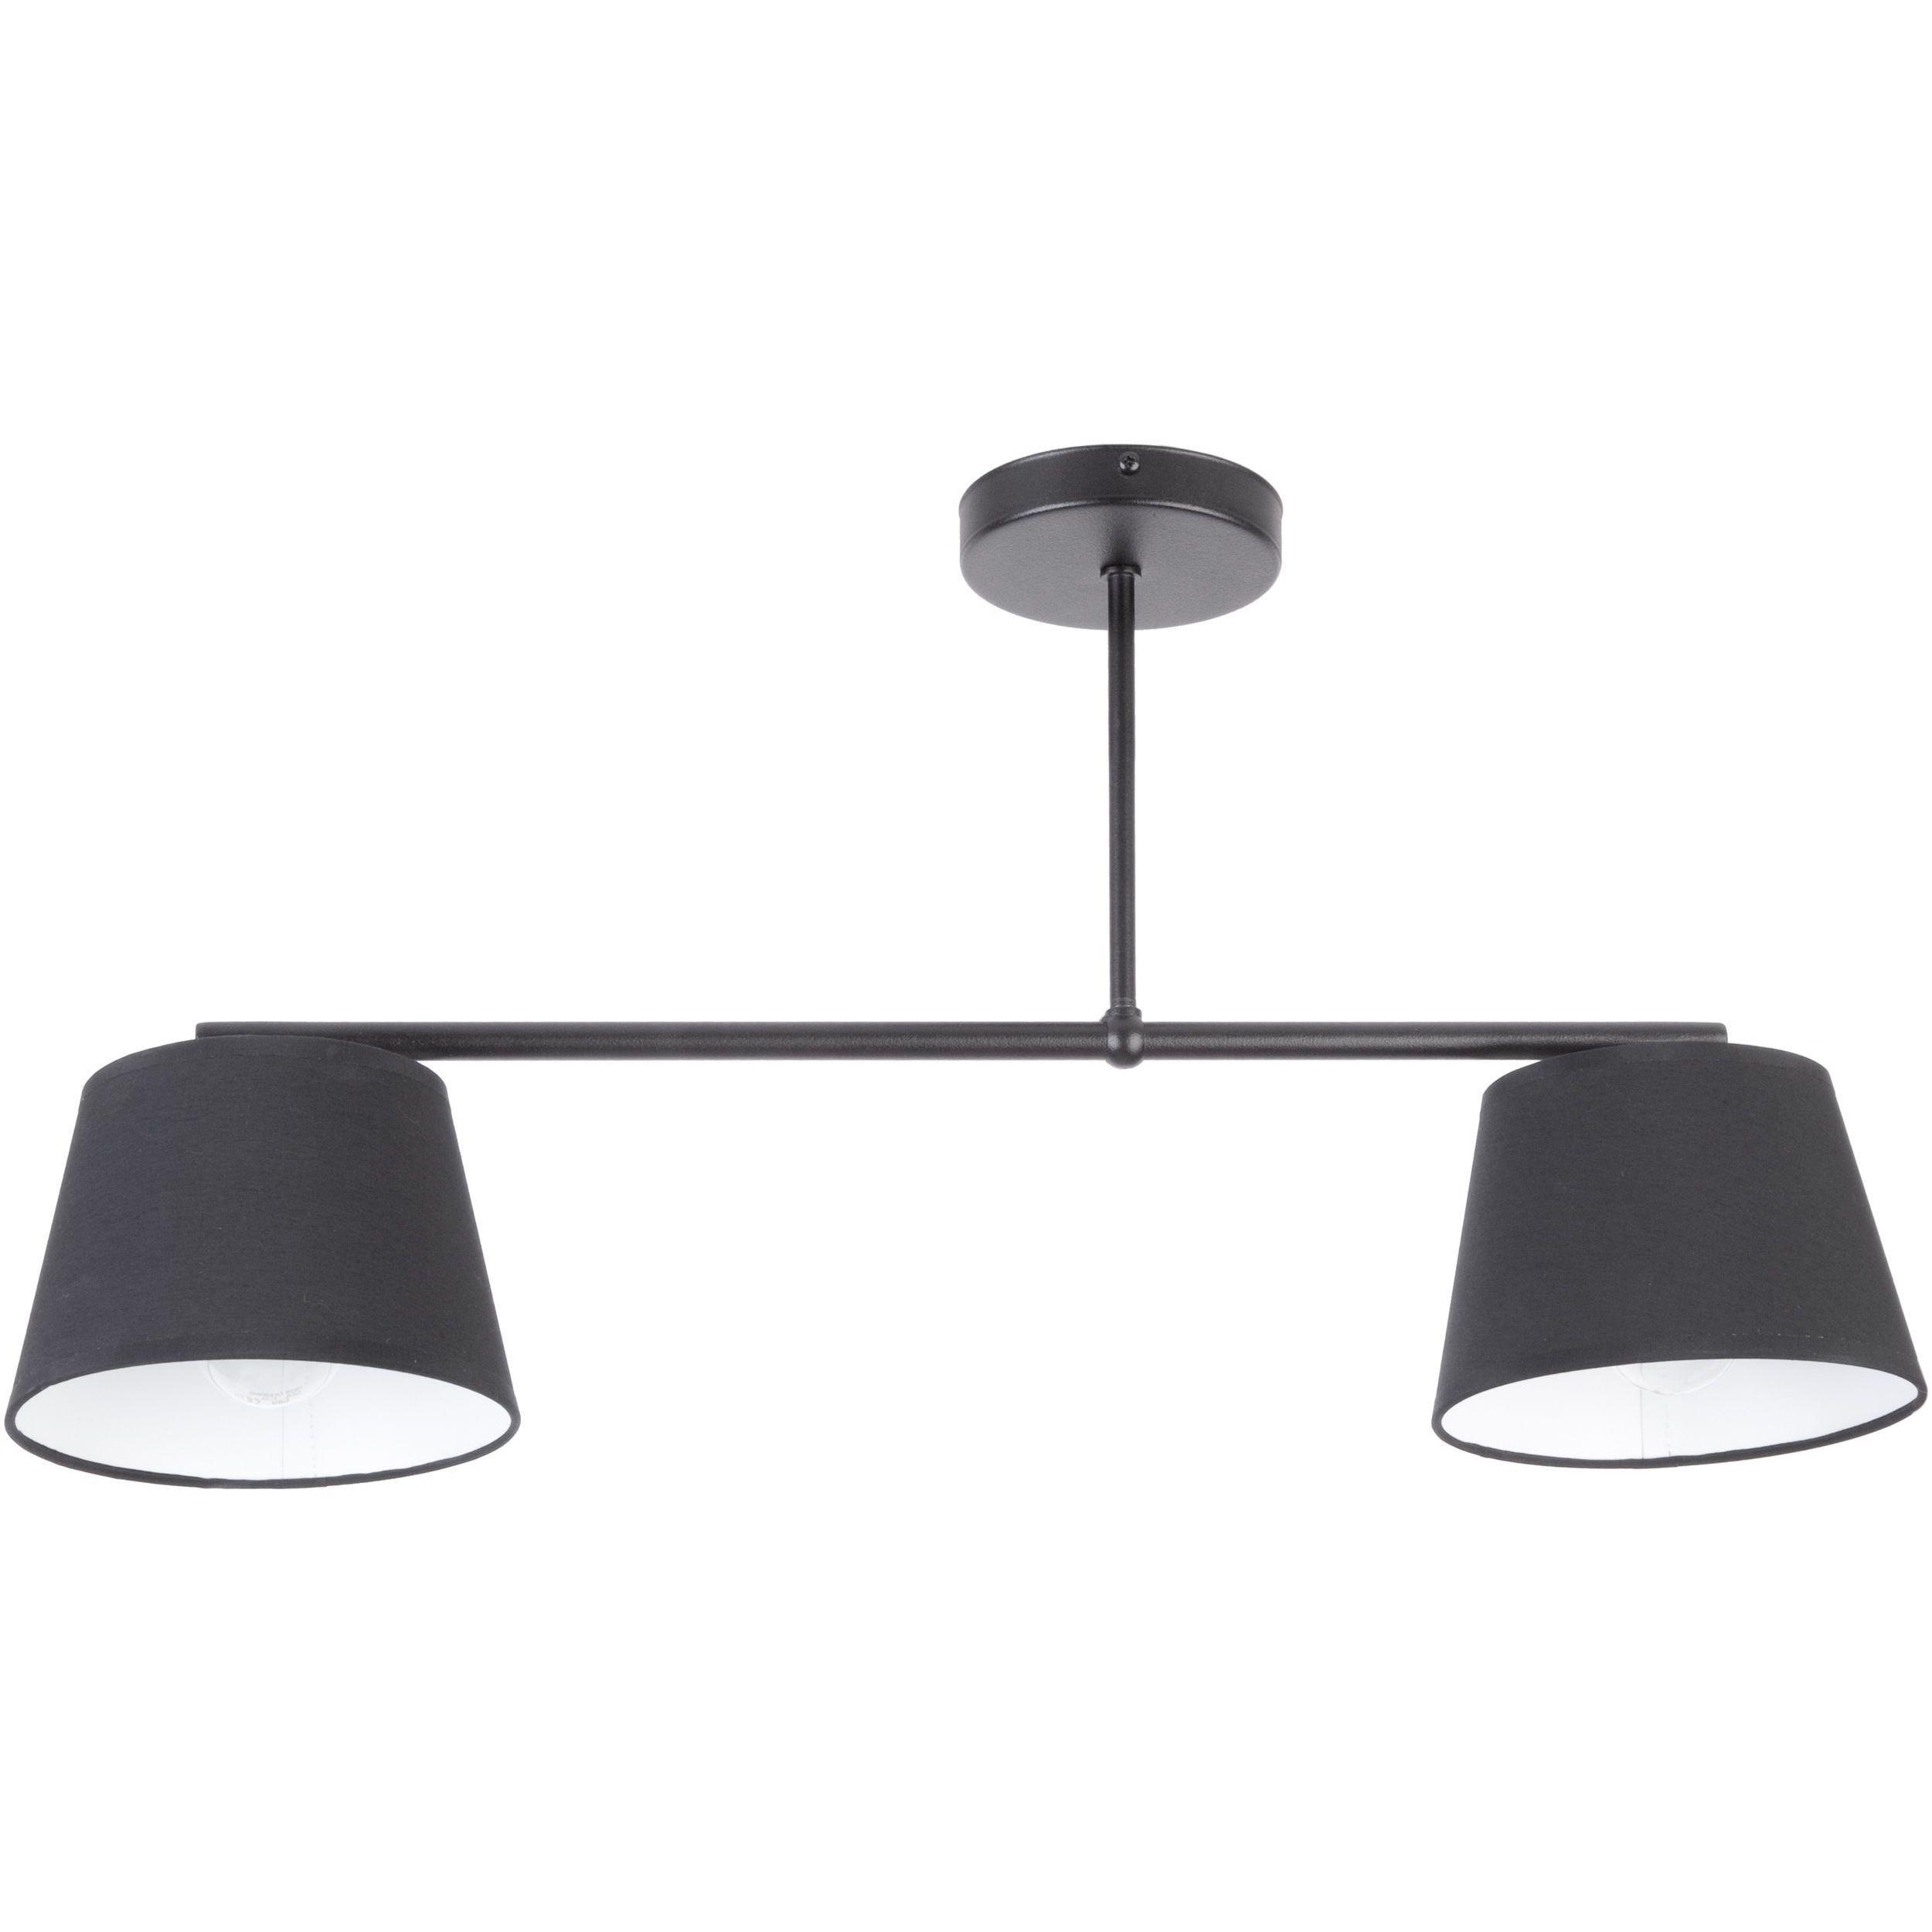 Lampa sufitowa Sigma Febe x2 Czarny